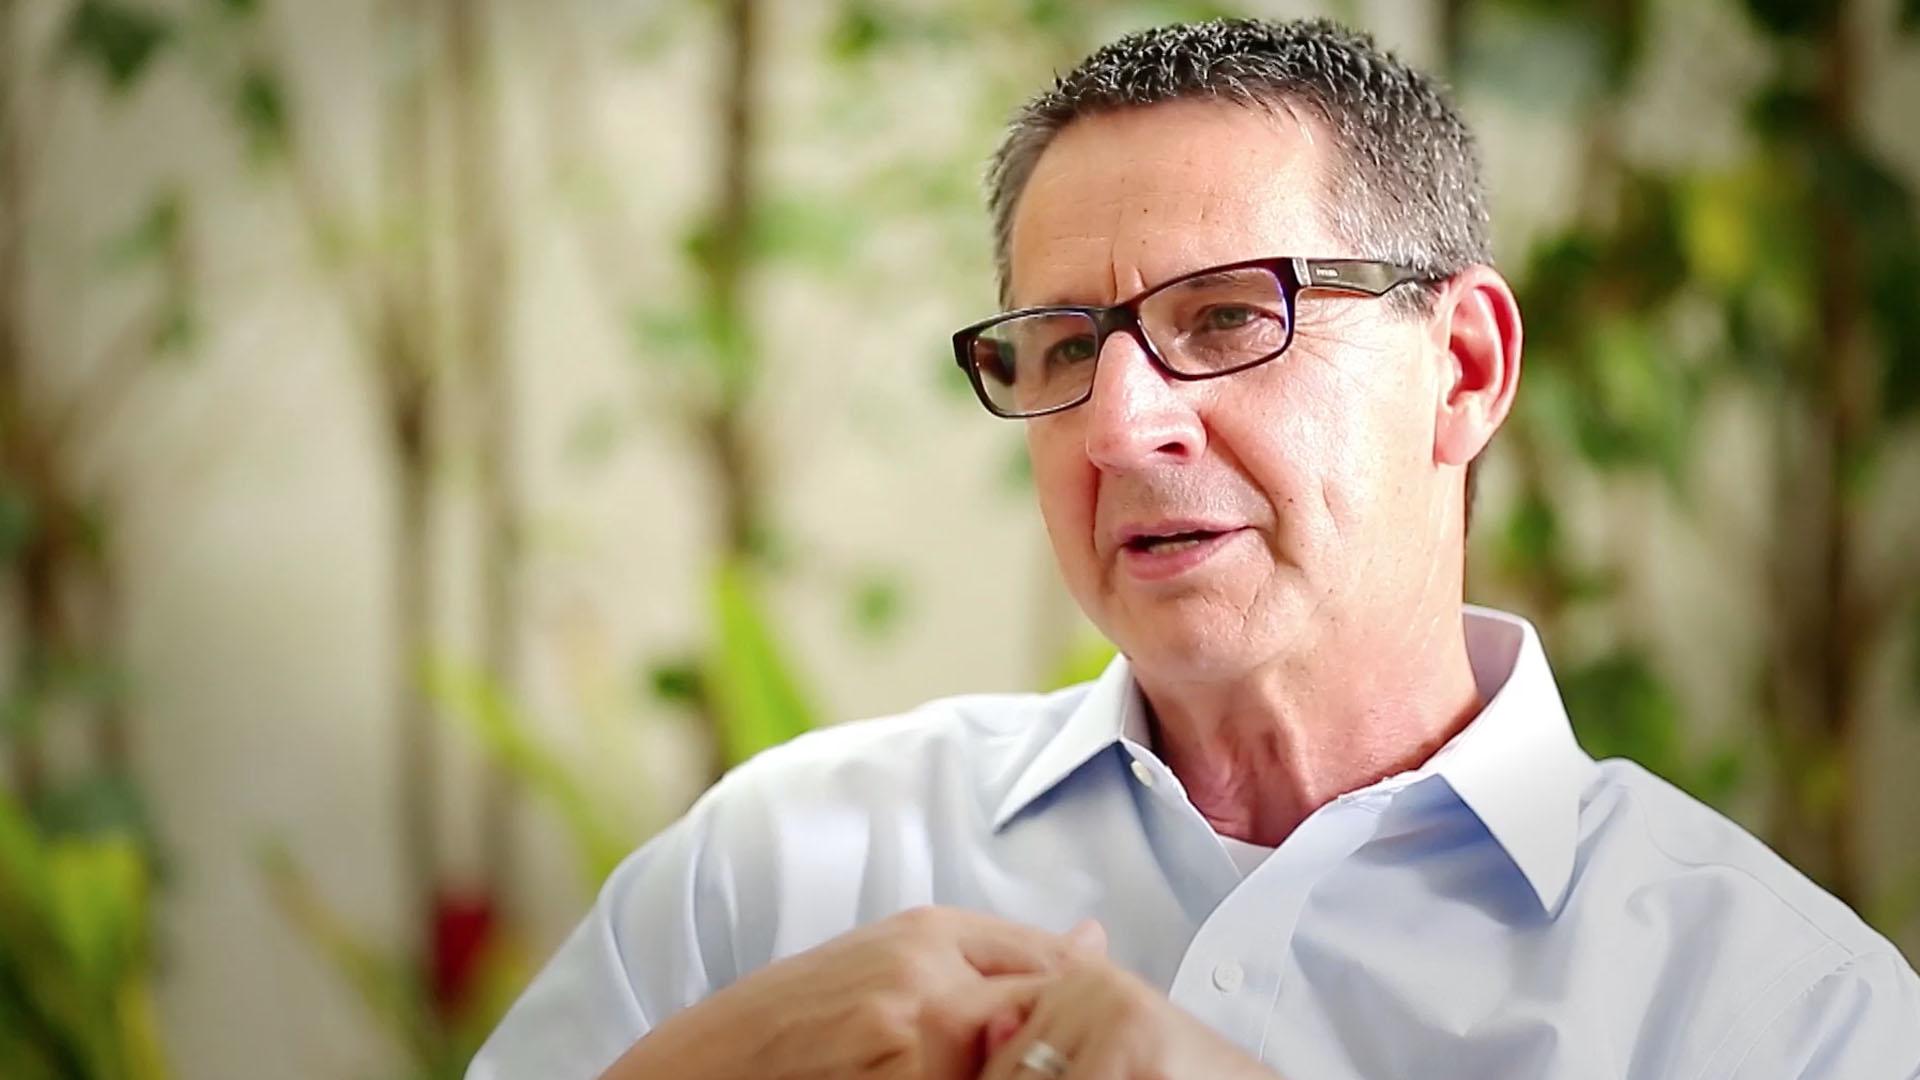 Elói D'Avila, fundador da Flytour, ensina como vender e fidelizar o seu cliente